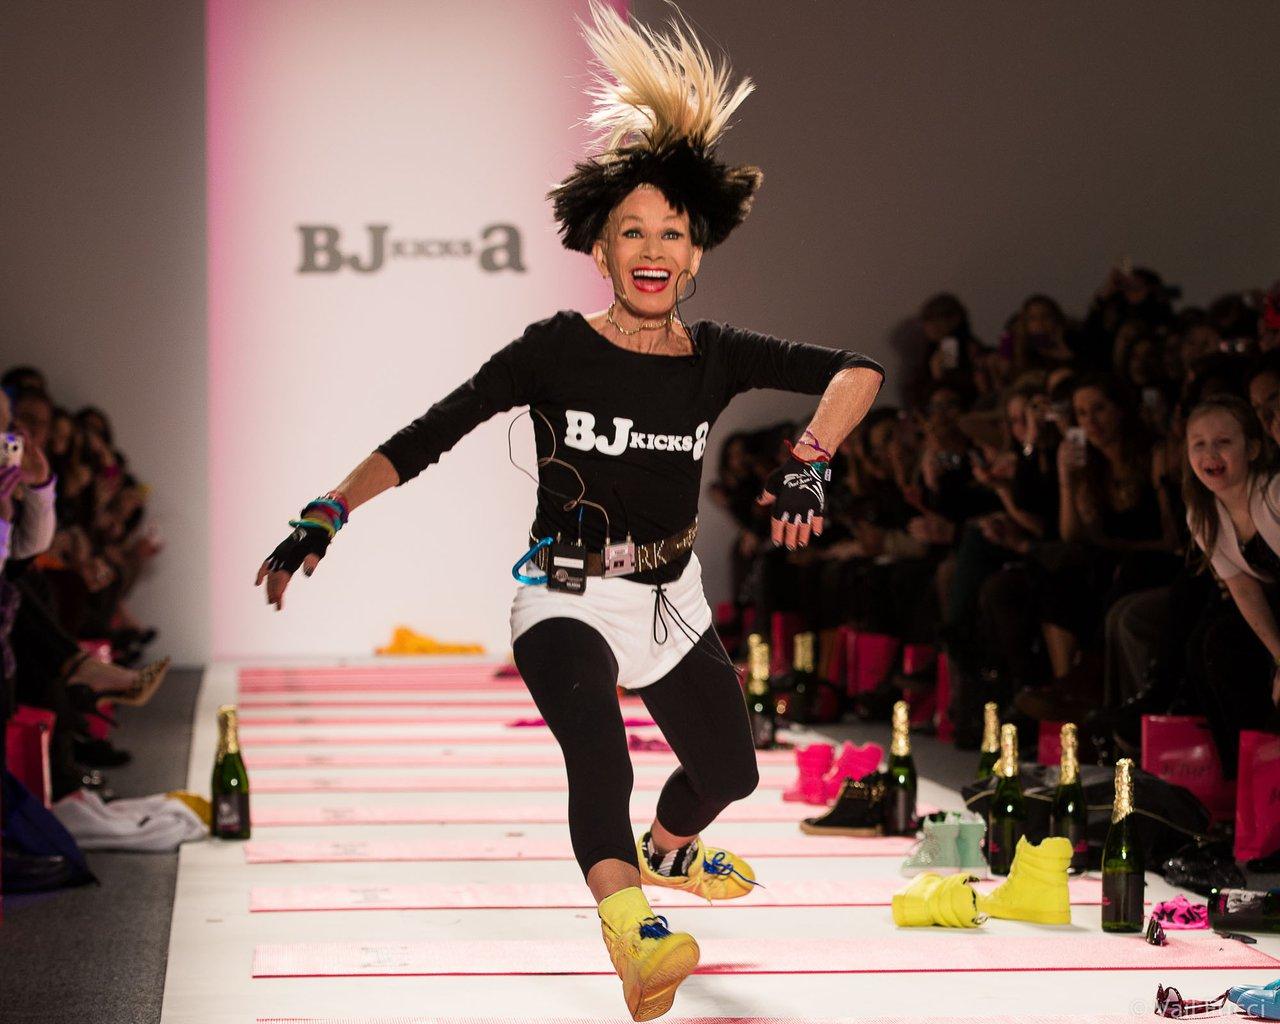 New York Fashion Week photo optimized-vail-fucci-186Betsey-Johnson-Work-Out-Fall-2013-Winter-2014-morgan-taylor-Vail-Fucci-fashion-week8375-2-2.jpg